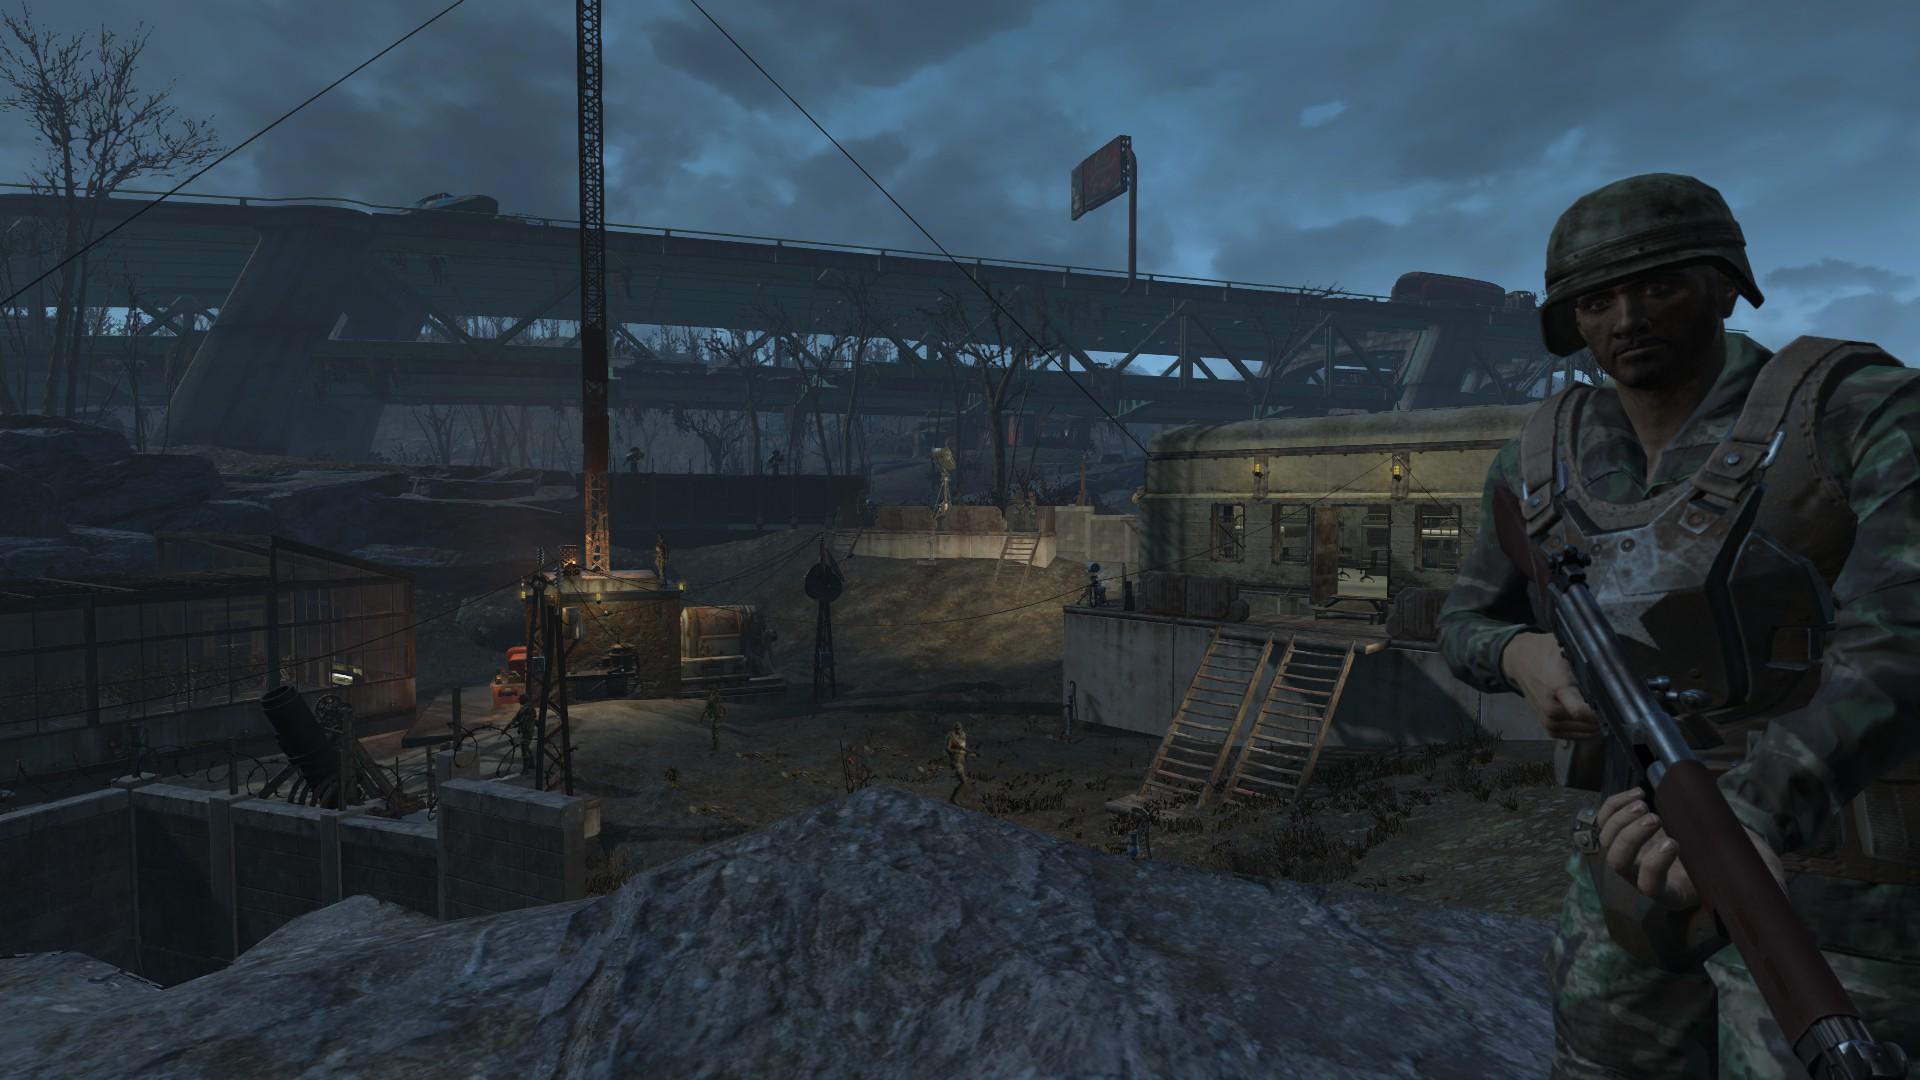 Show your Fallout 4 Settlements! CEE933EDA606A1E5168DBF64992E5CEBAF28E52A